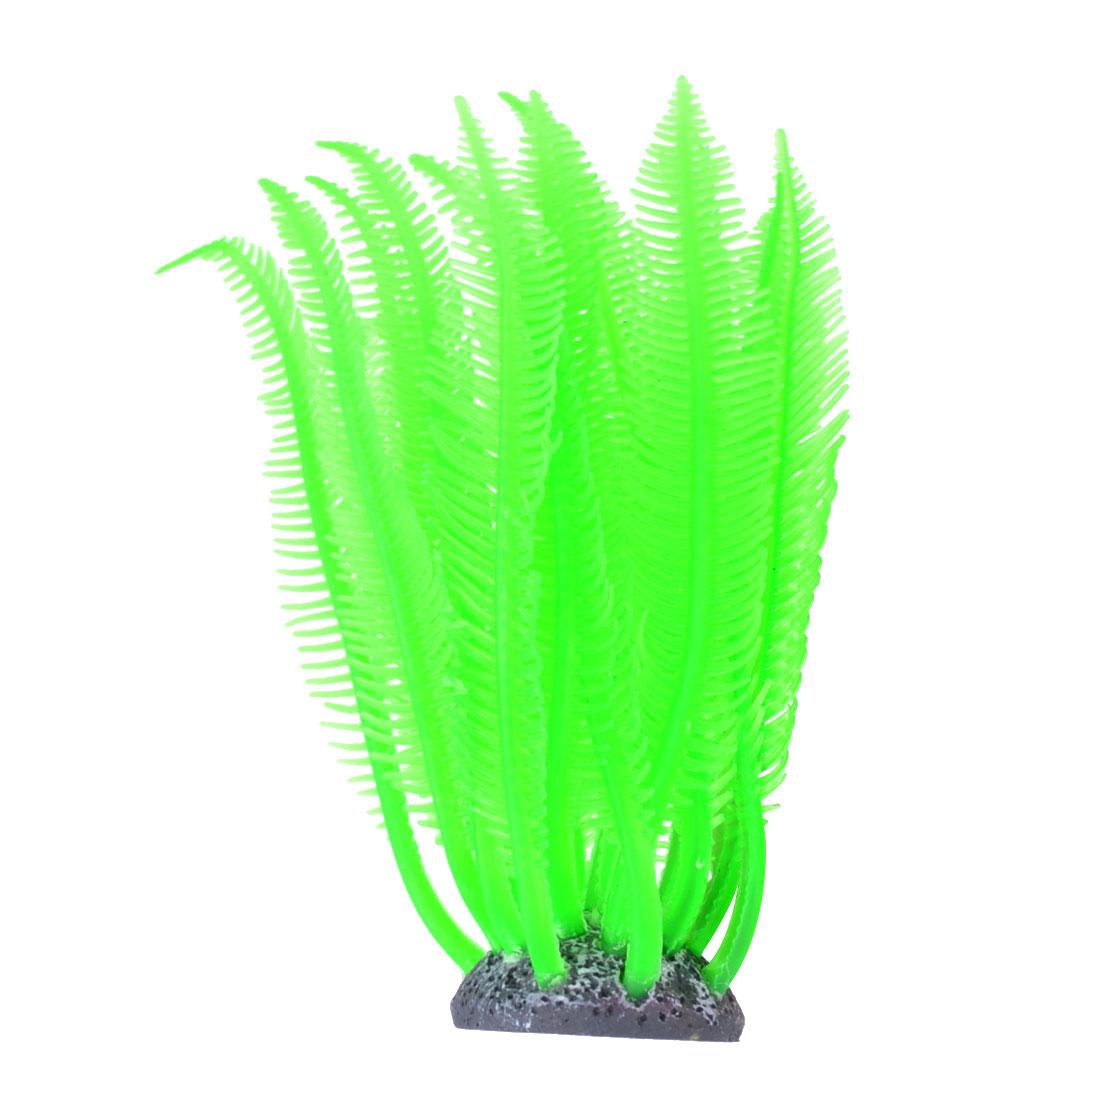 Fisk Tank Ornament Black Ceramic Base Emulation Artificial Green Soft Silicone Plant